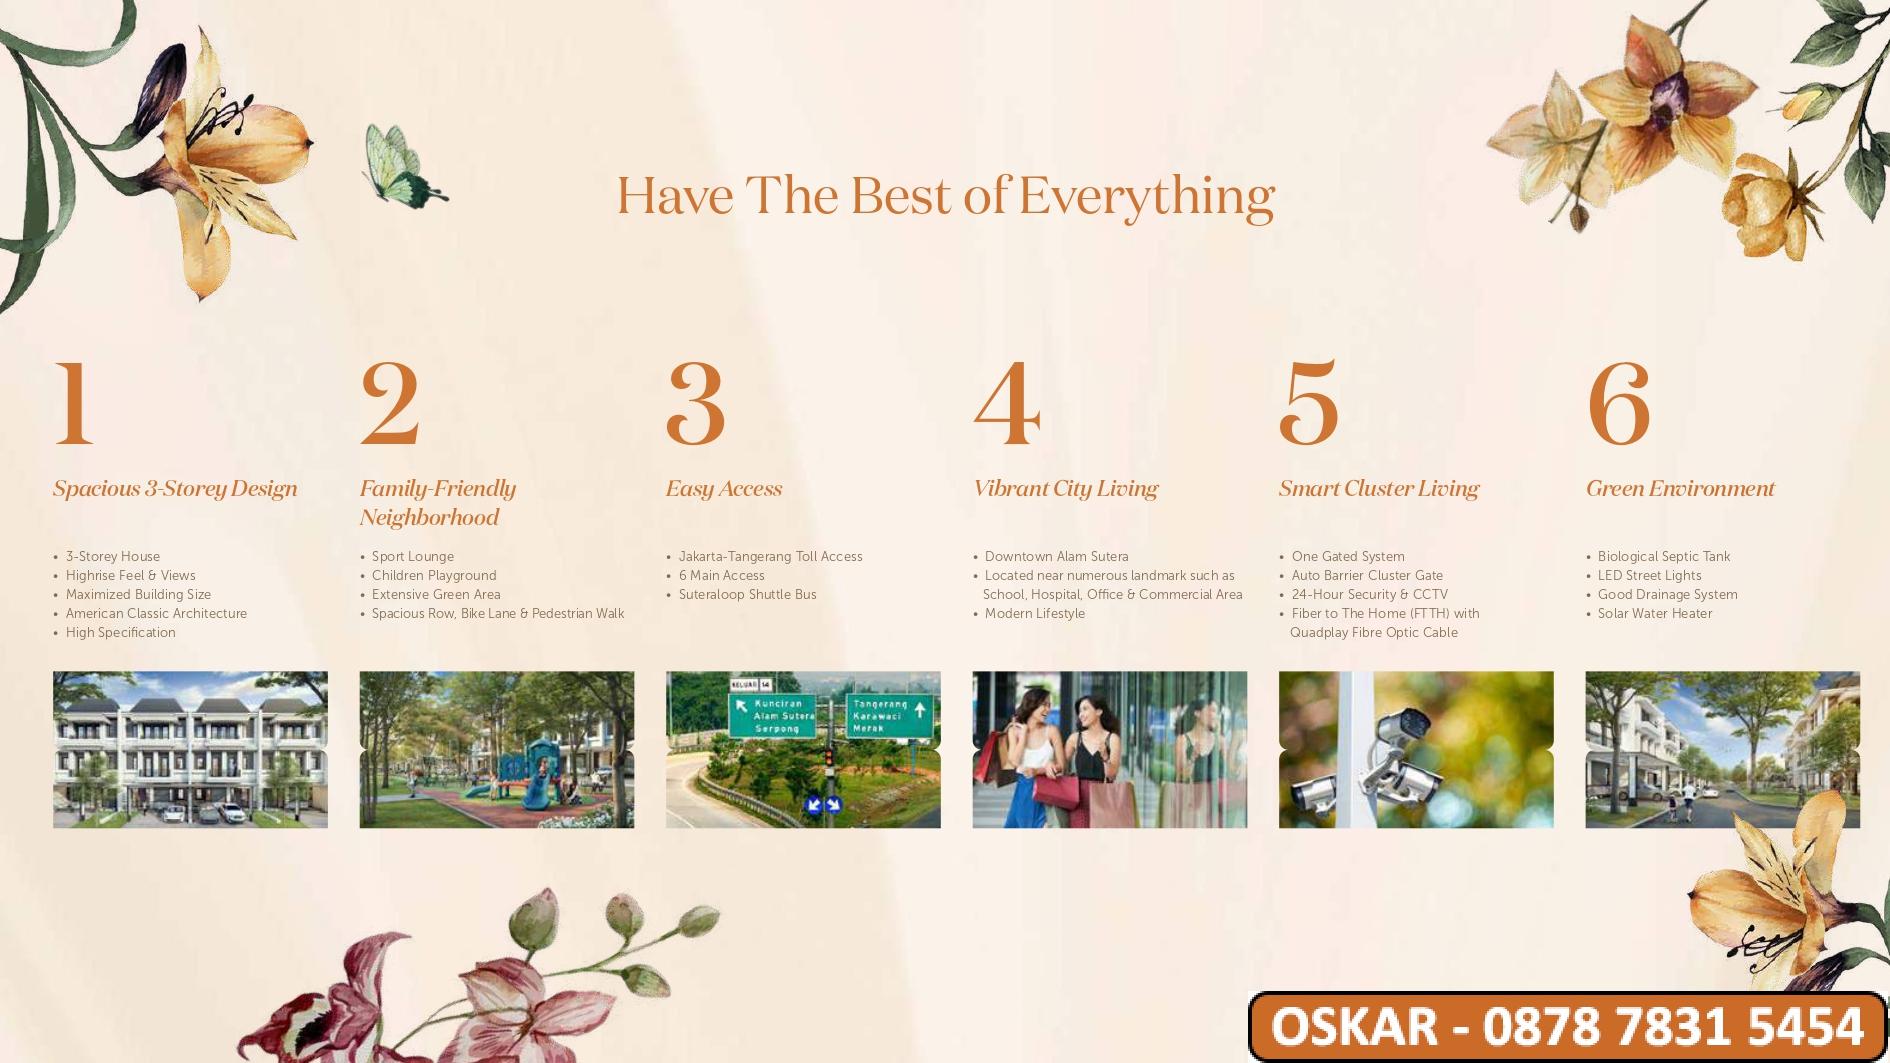 E-Brochure Alam Sutera Winona - Oskar_page-0014